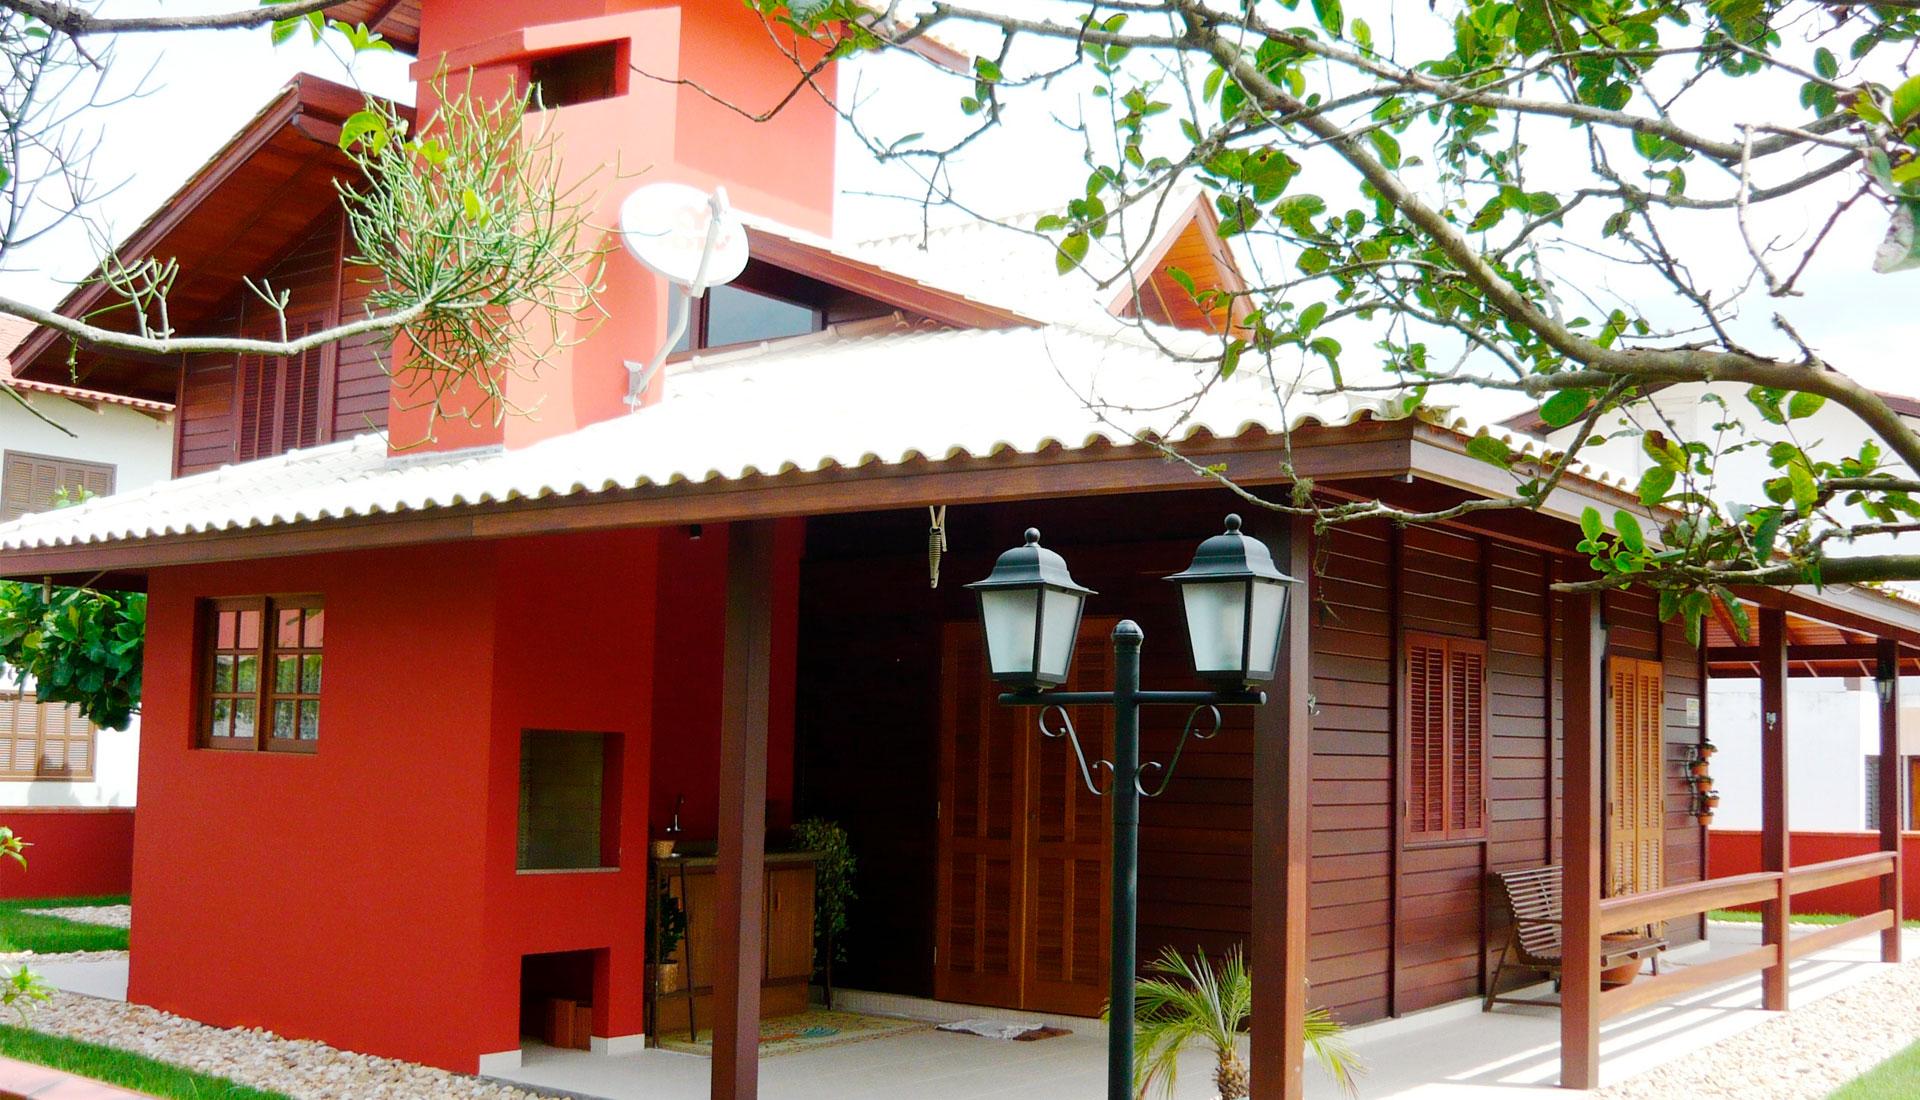 Cores de Casas de Madeira